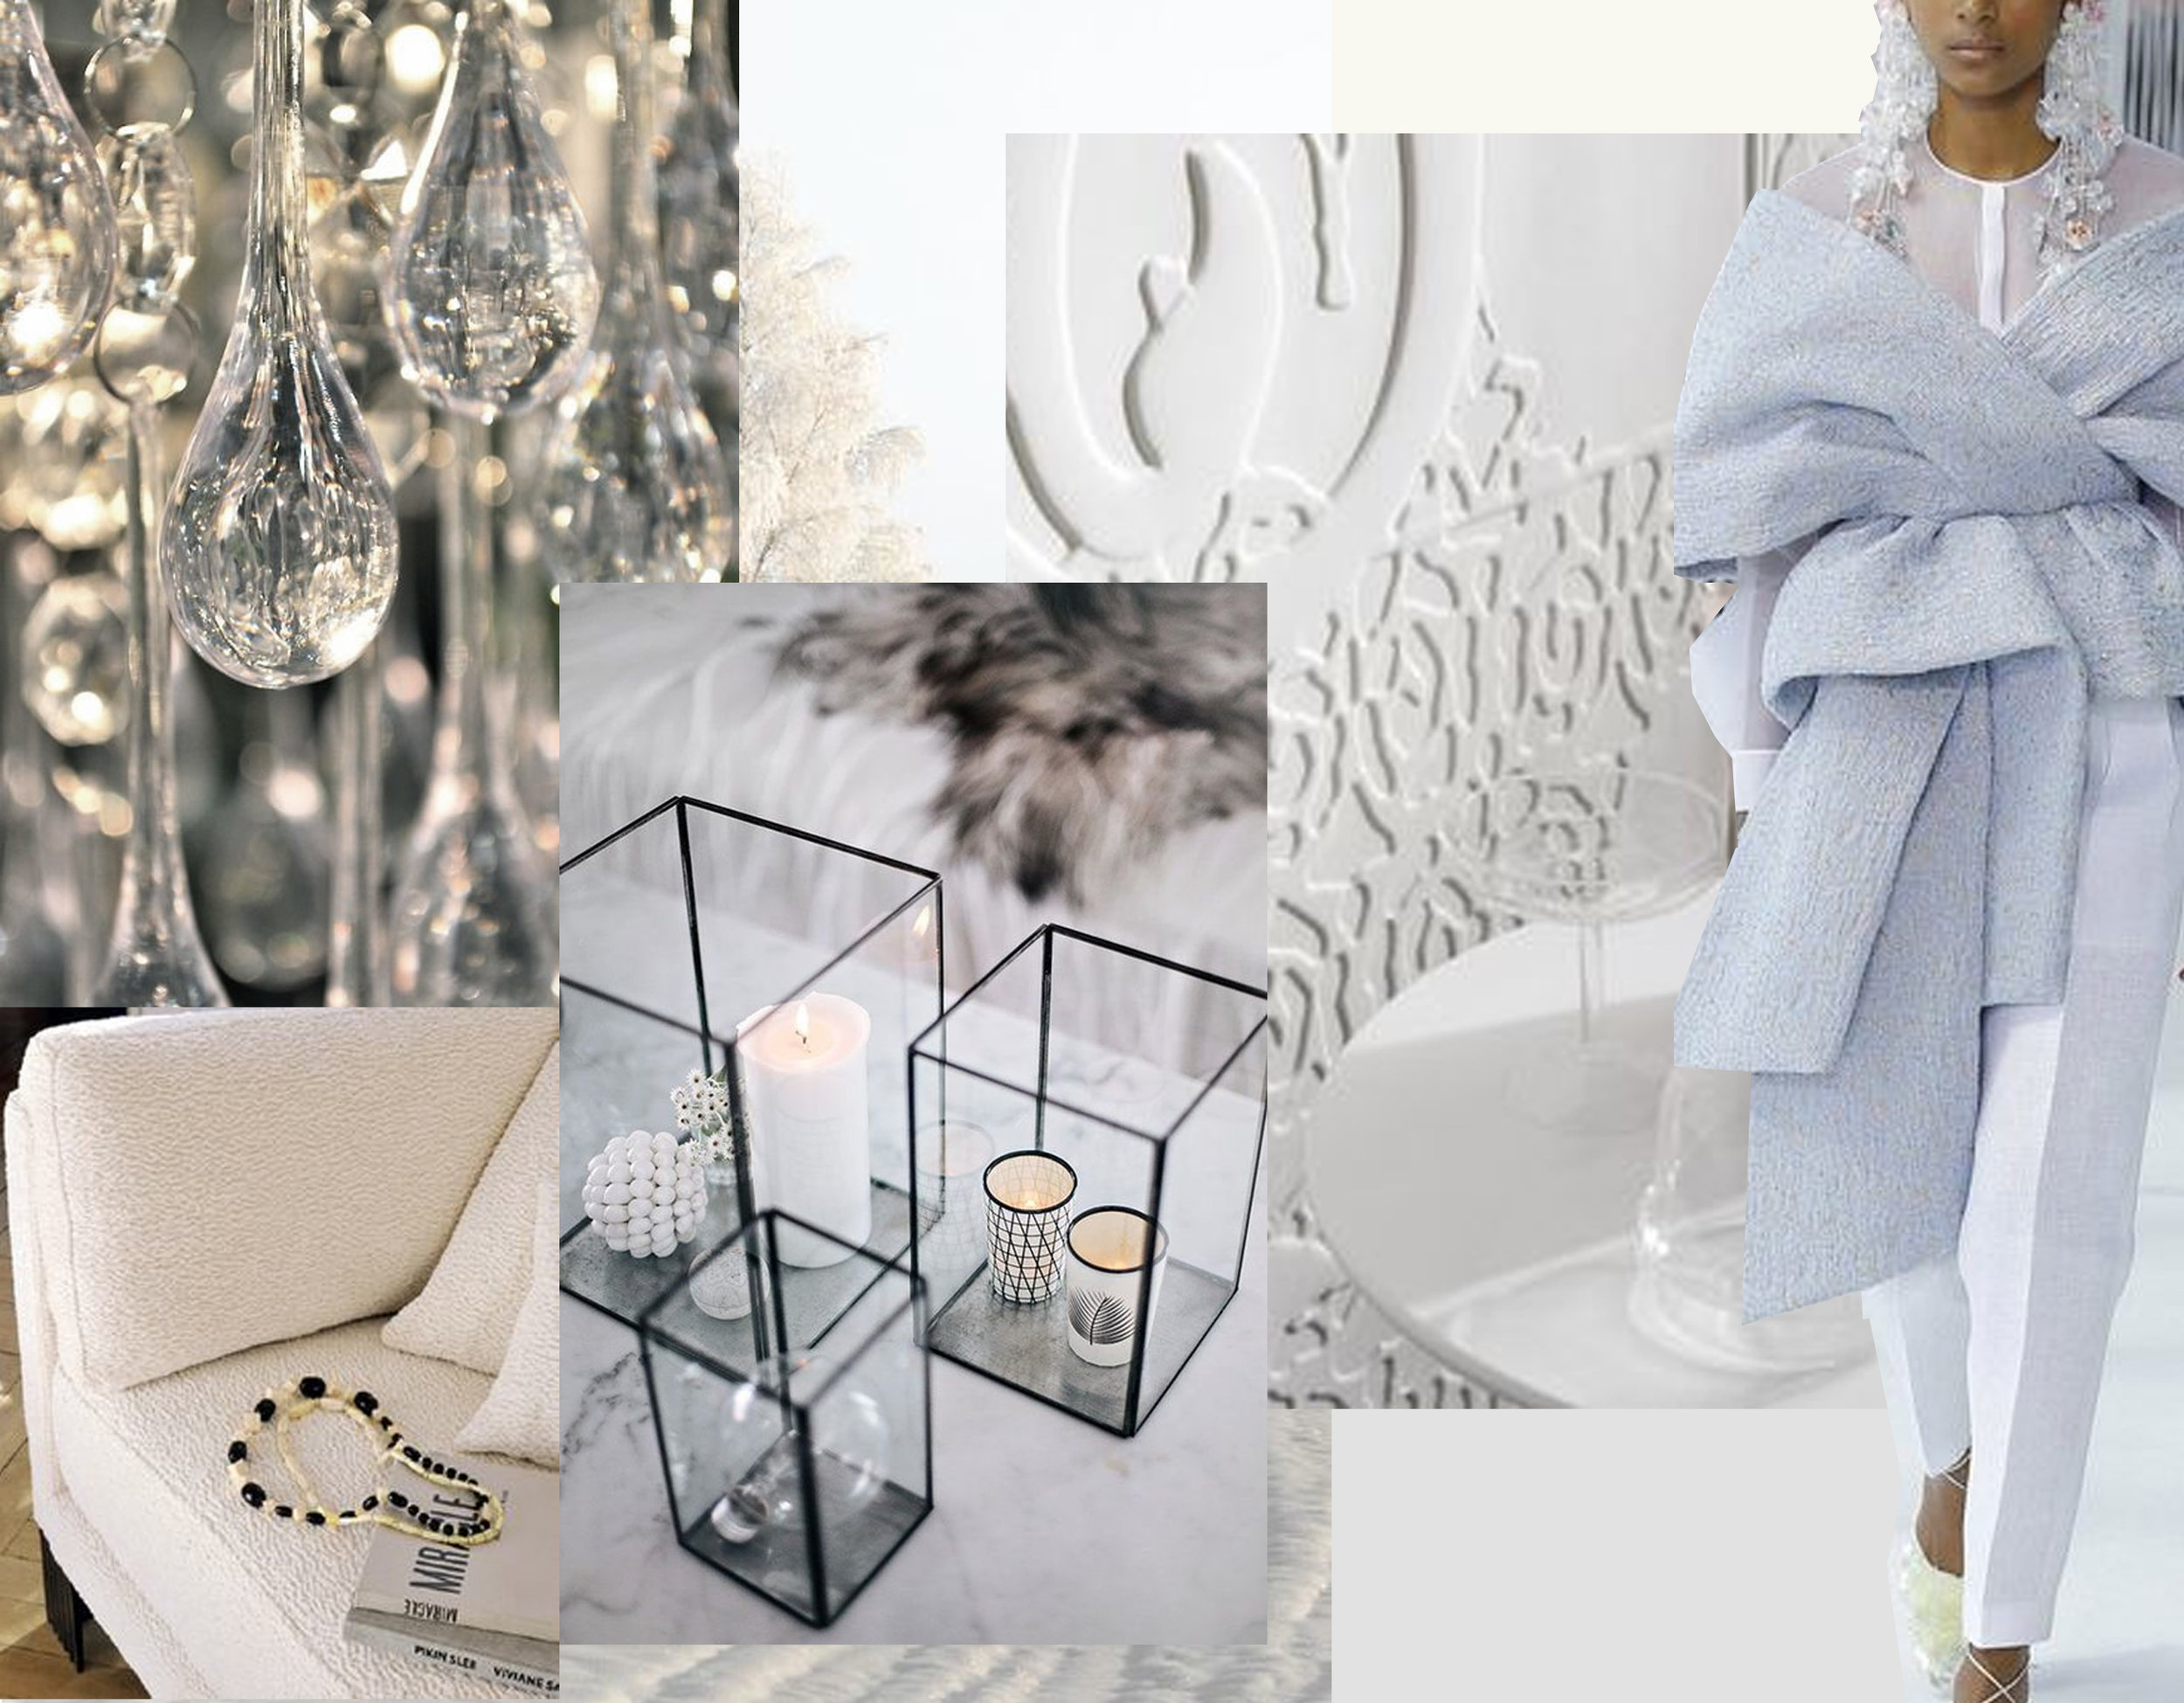 glass drops via  Stellarsk y - fabric on armchair Astrakan  Elitis  - bas-relief wallpaper Loop  Elitis  - candls via  Kreativk  -  Delpozo  spring 2017